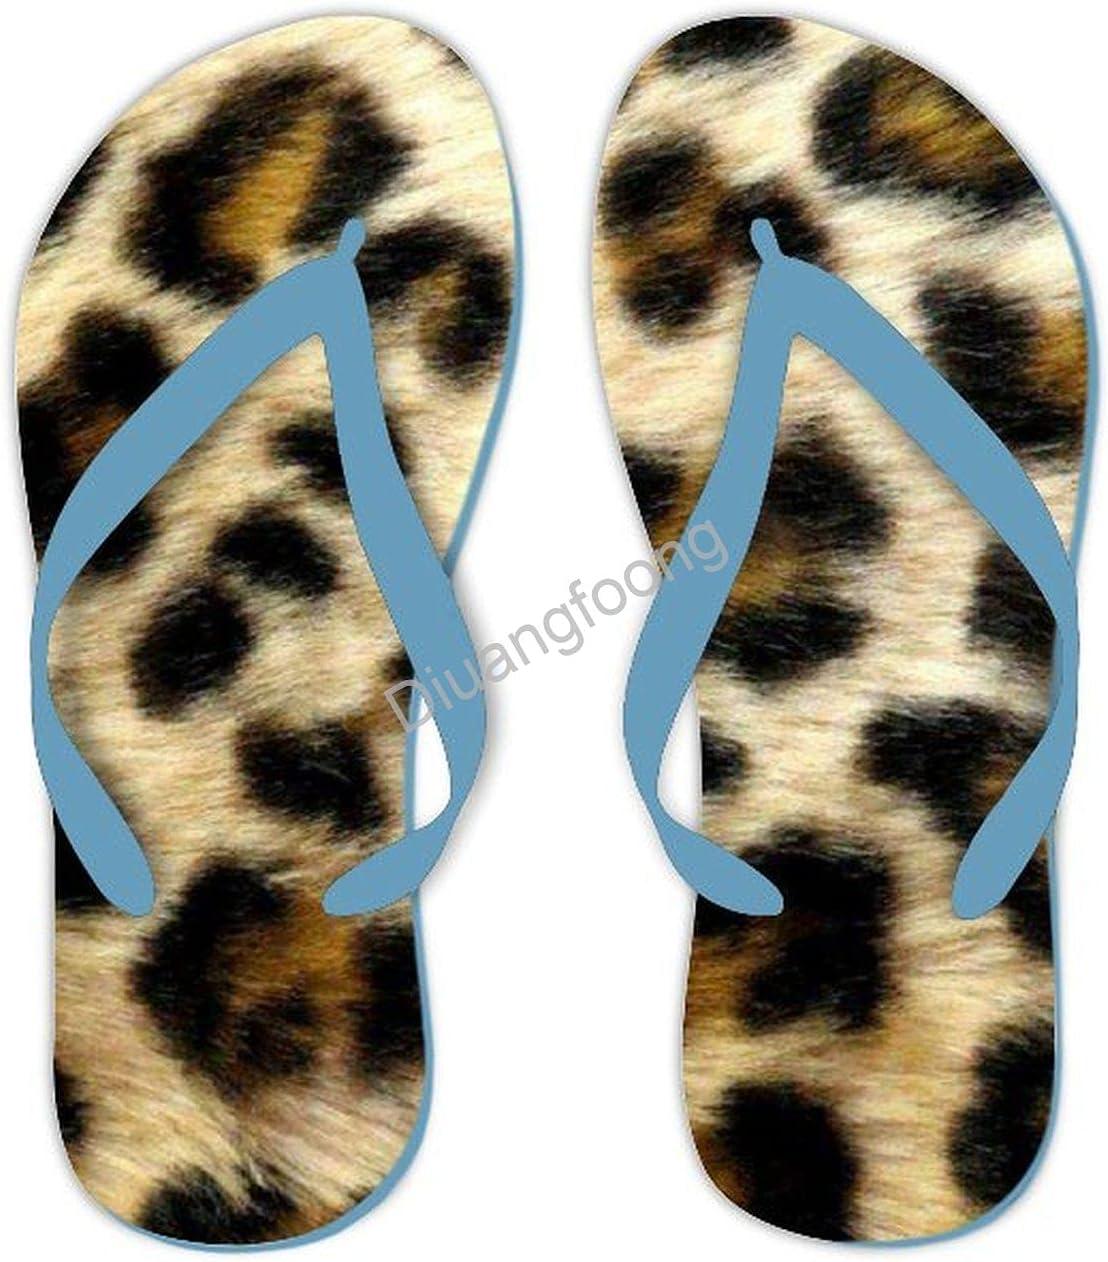 Leopard Flip Flop Designer Fashion Thong Sandal Fun Sandal For Outdoor Travel Shipping Blue Style4